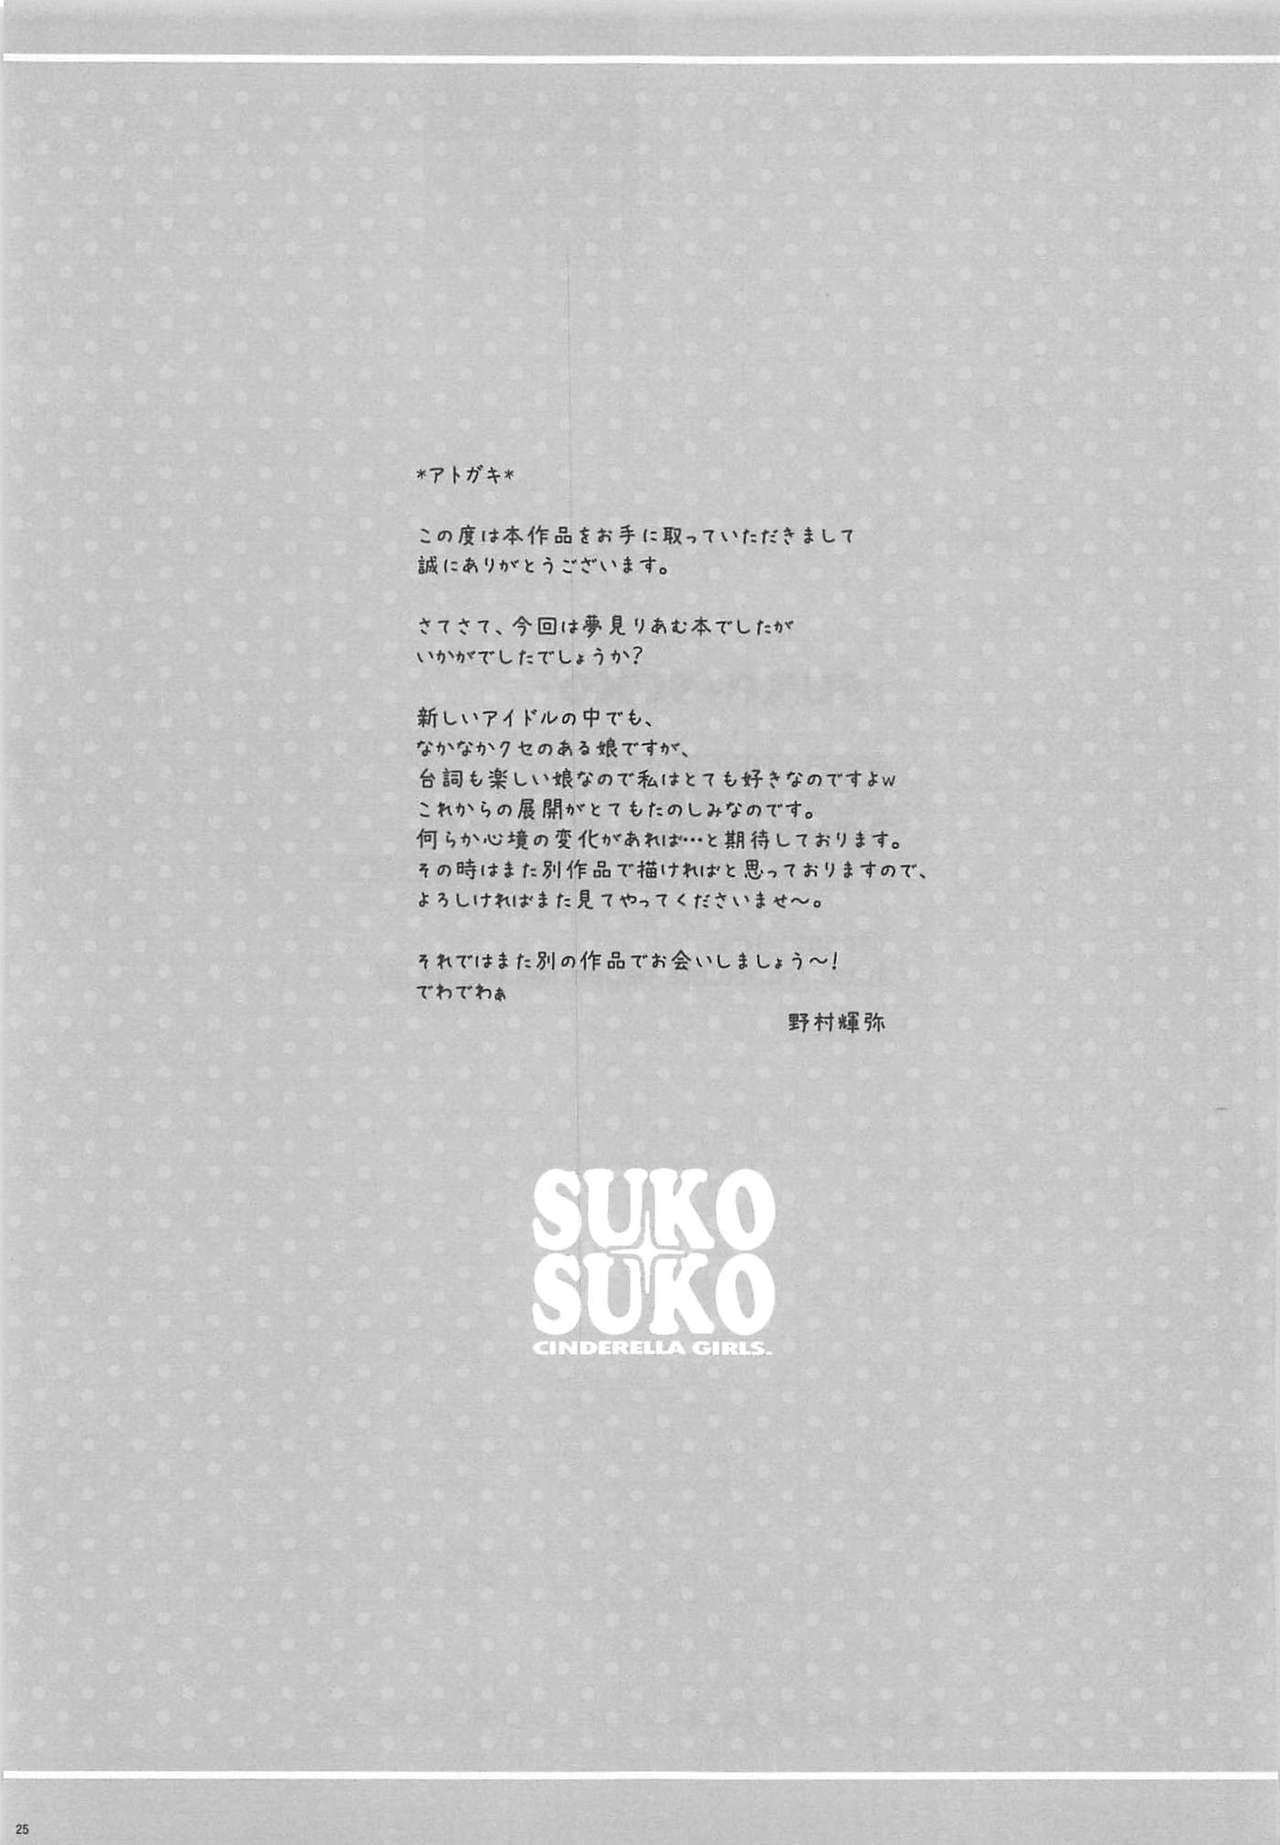 SUKO + SUKO 23